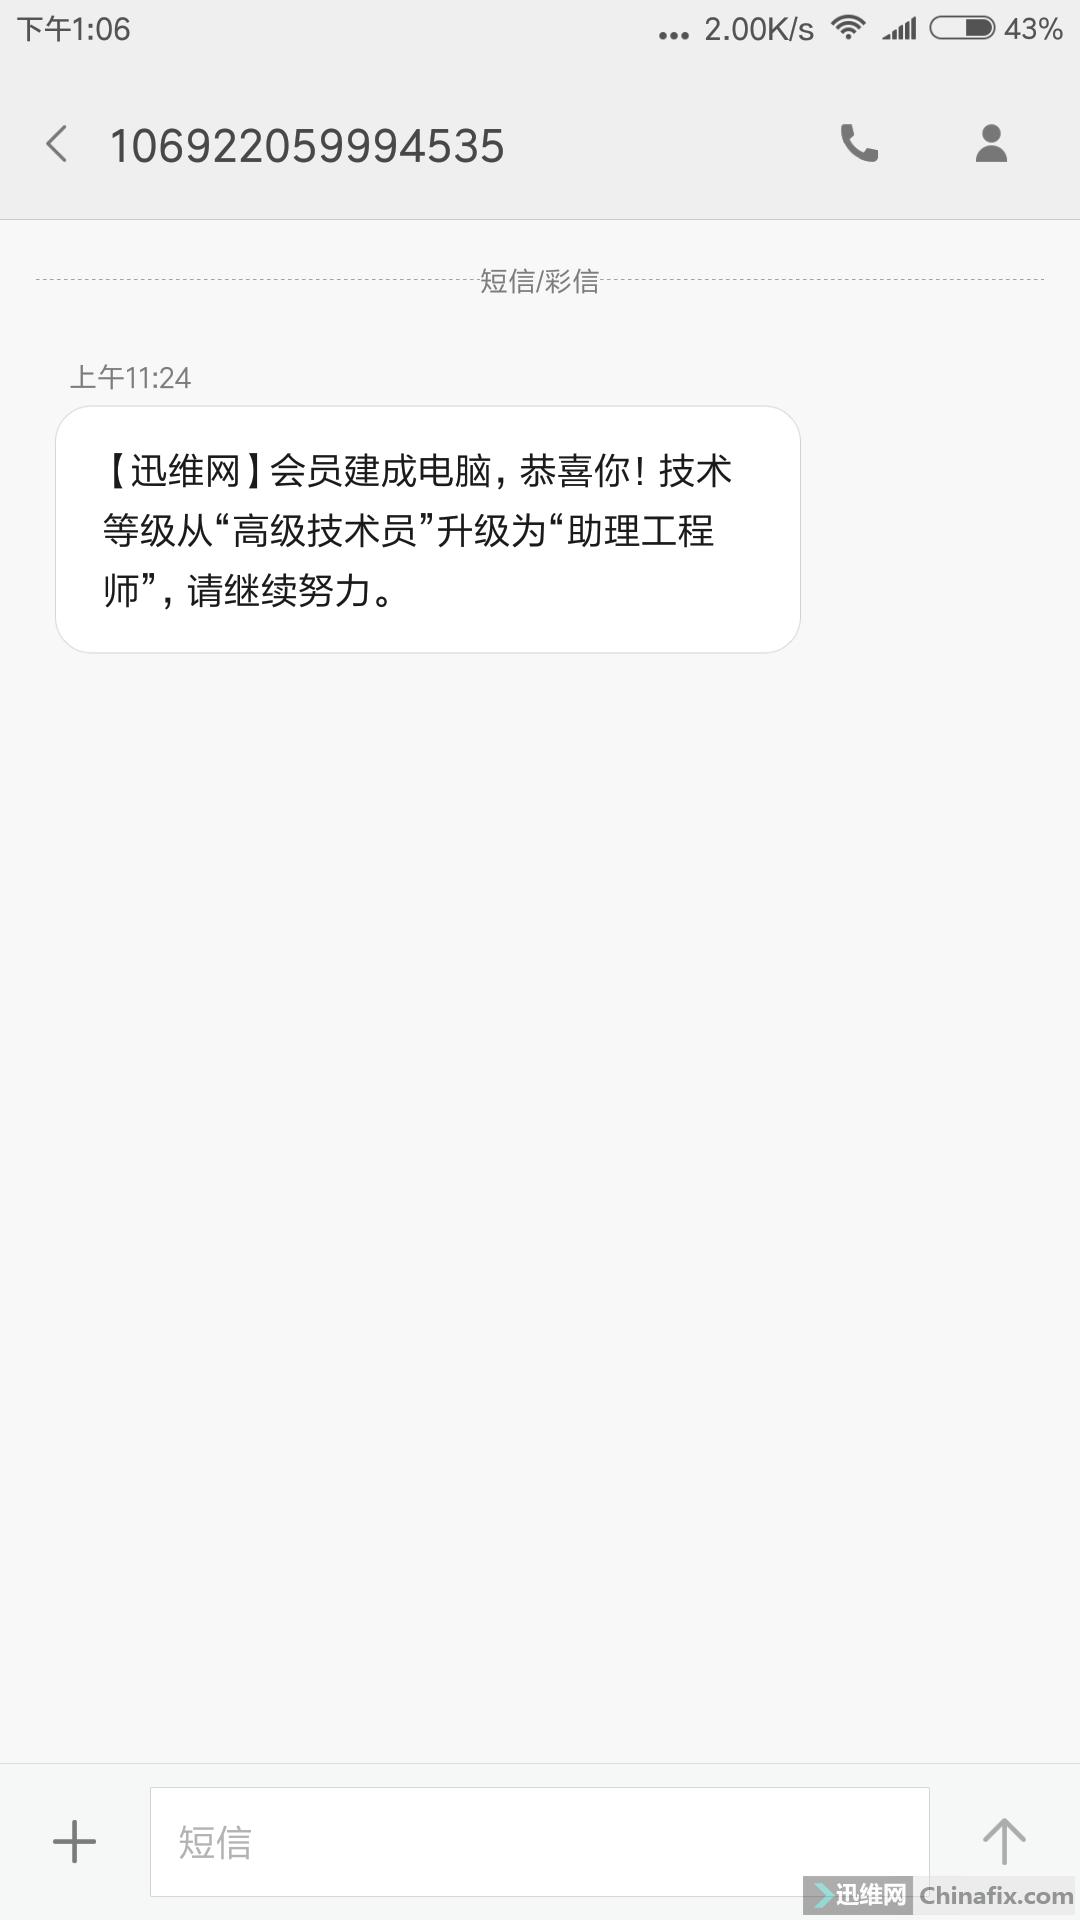 Screenshot_2018-01-30-13-06-54-673_com.android.mm.png